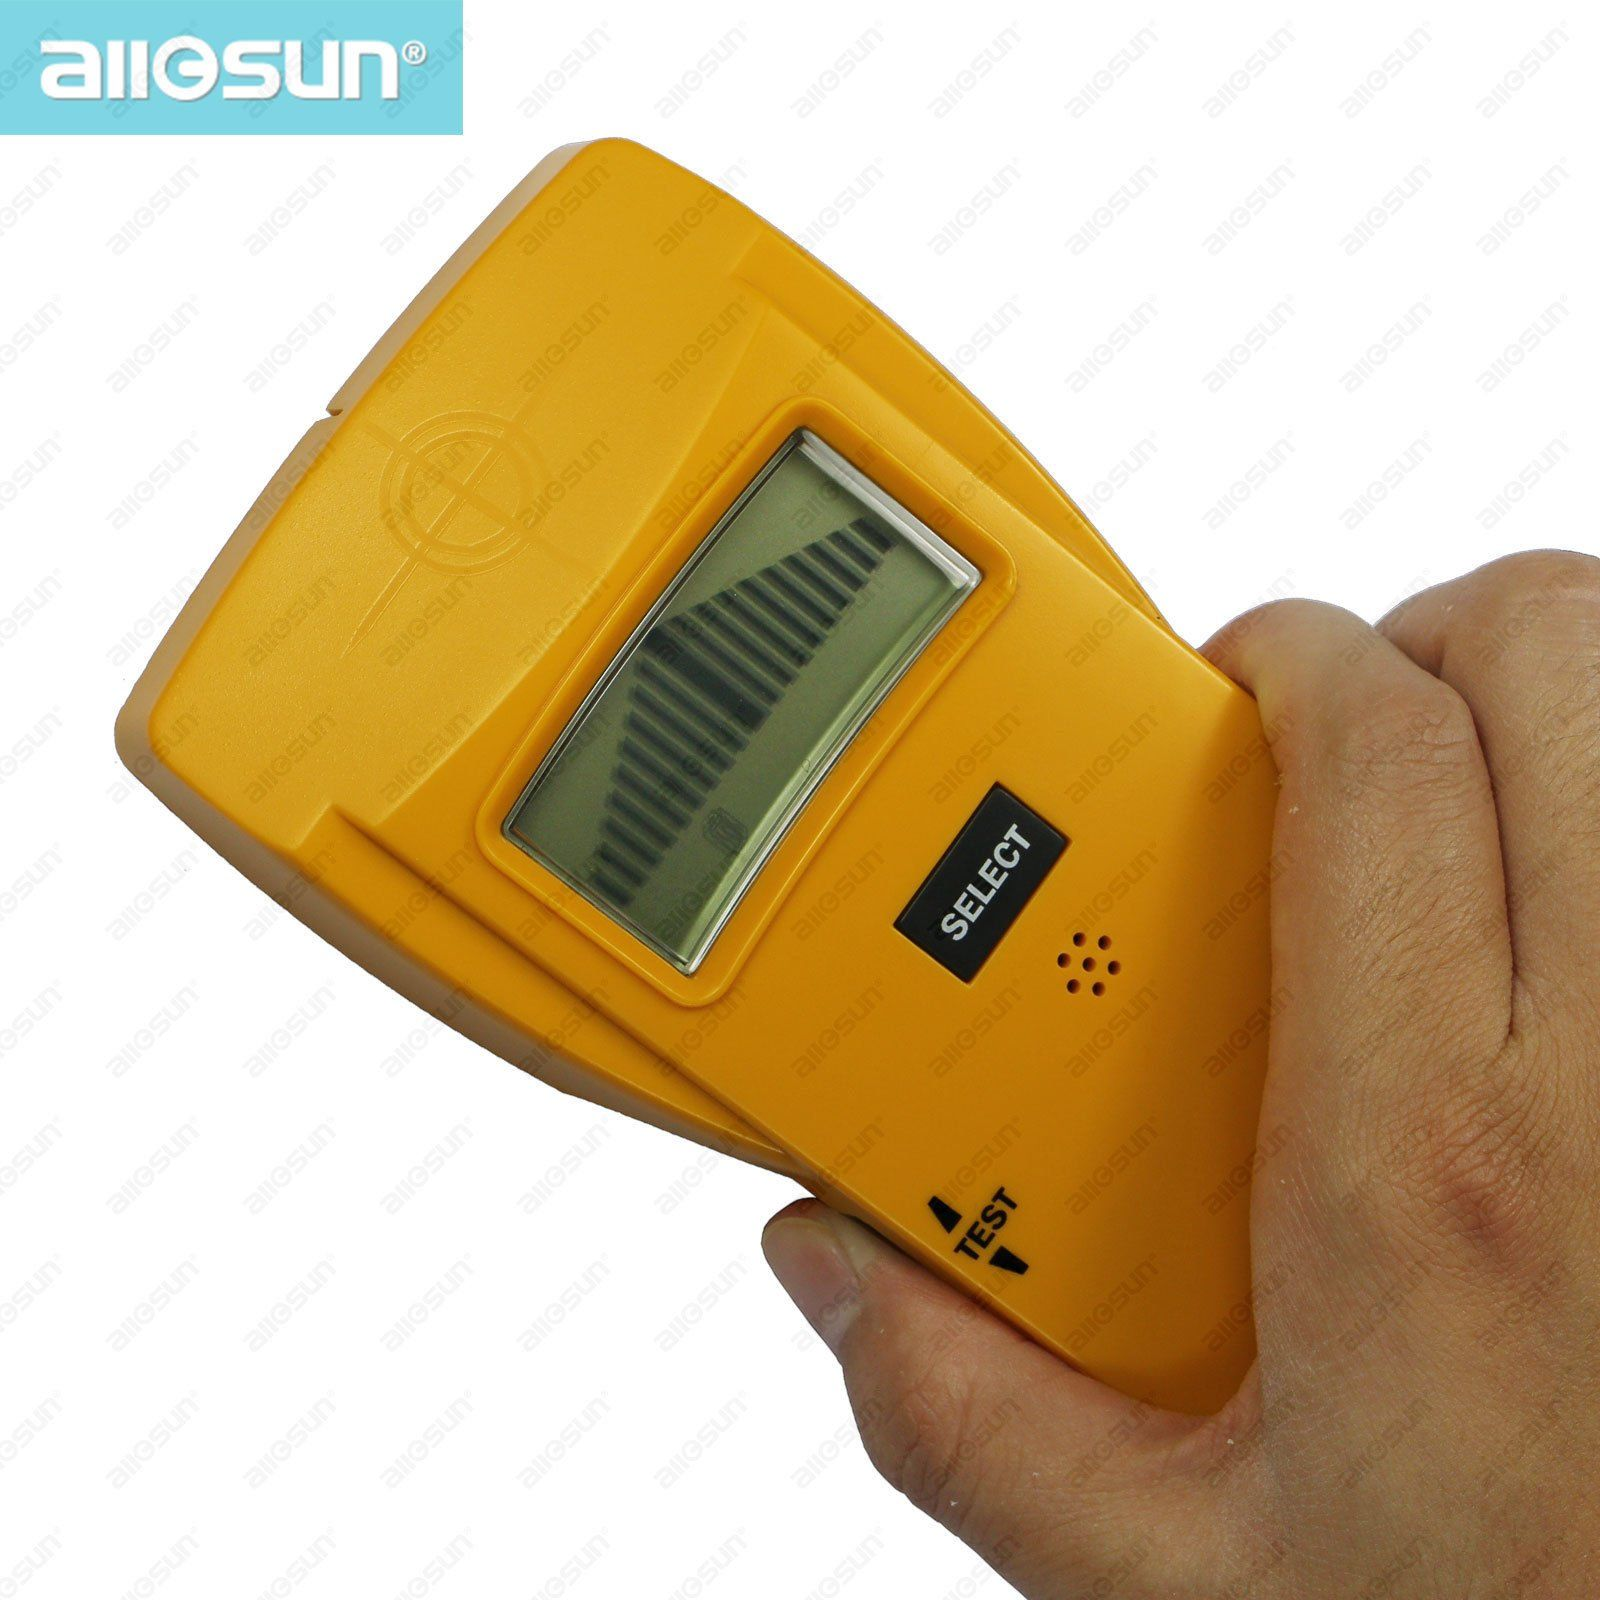 All-Sun TS79 Stud/Metal/AC Detector 3 In 1 Multiscanner Detector Home Tester Voltage Metal Sensor Finding Hidden Metallic Object